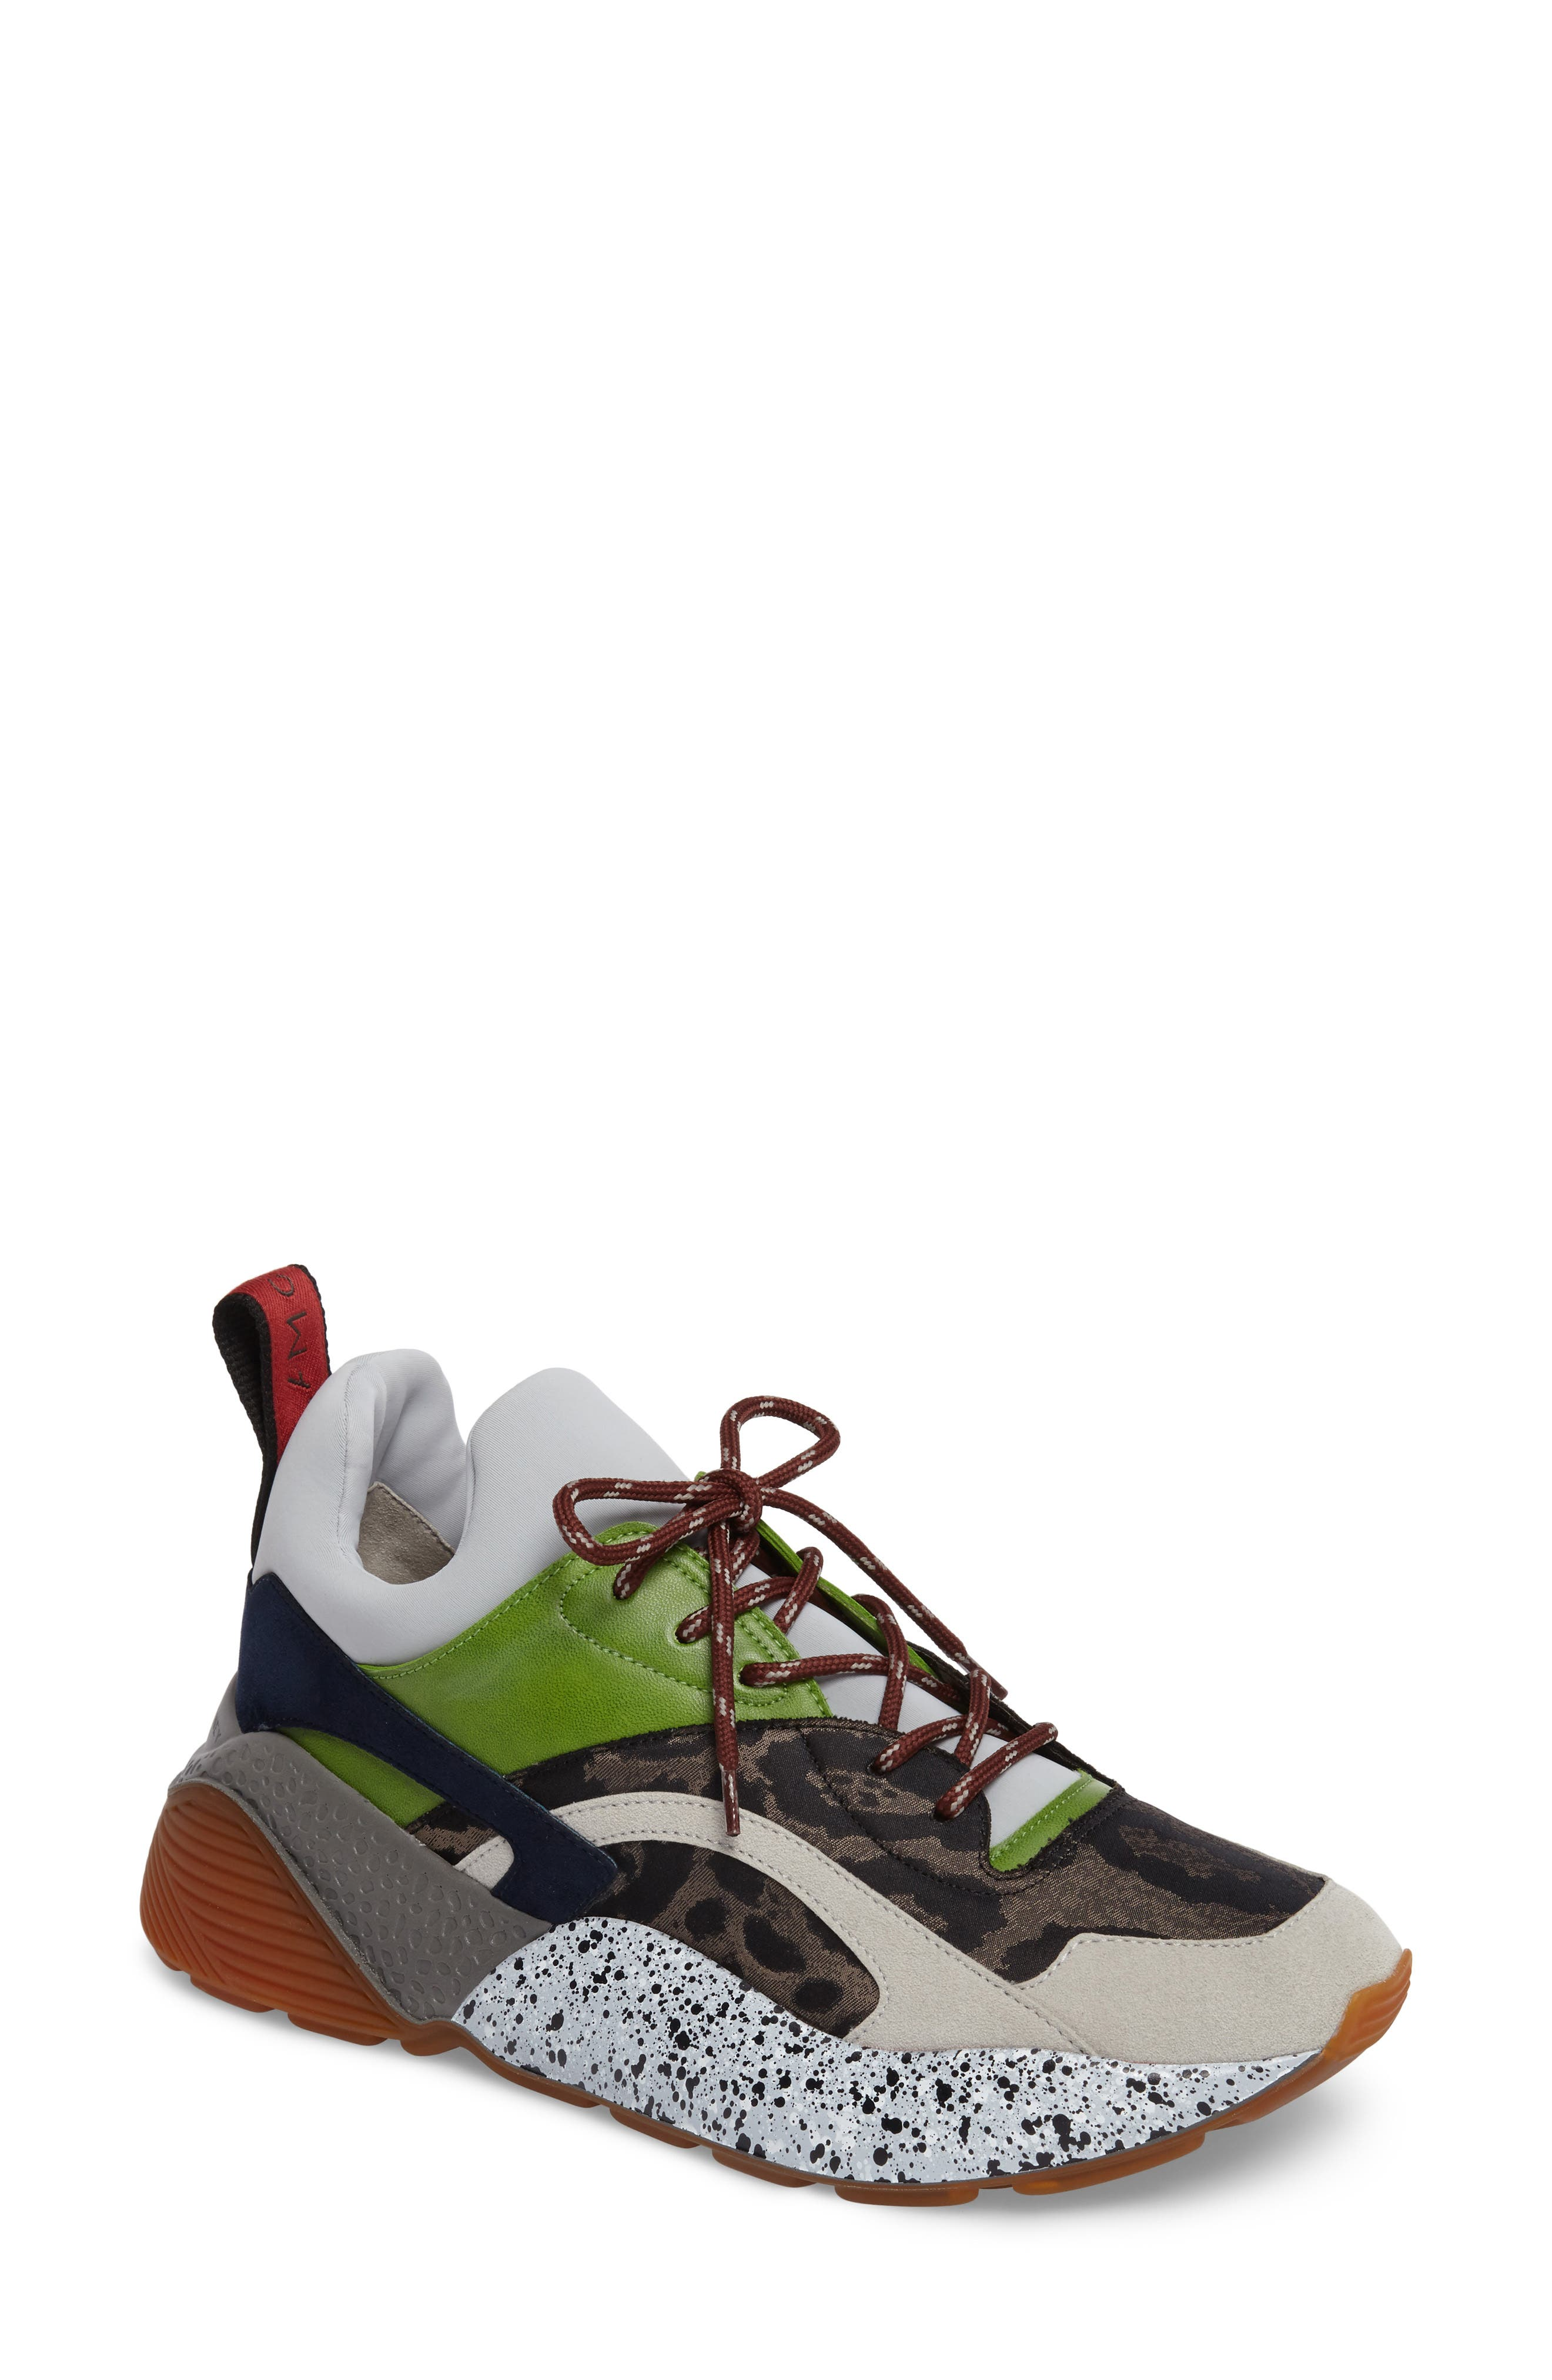 Eclypse Sneaker,                             Main thumbnail 1, color,                             Grey Multi